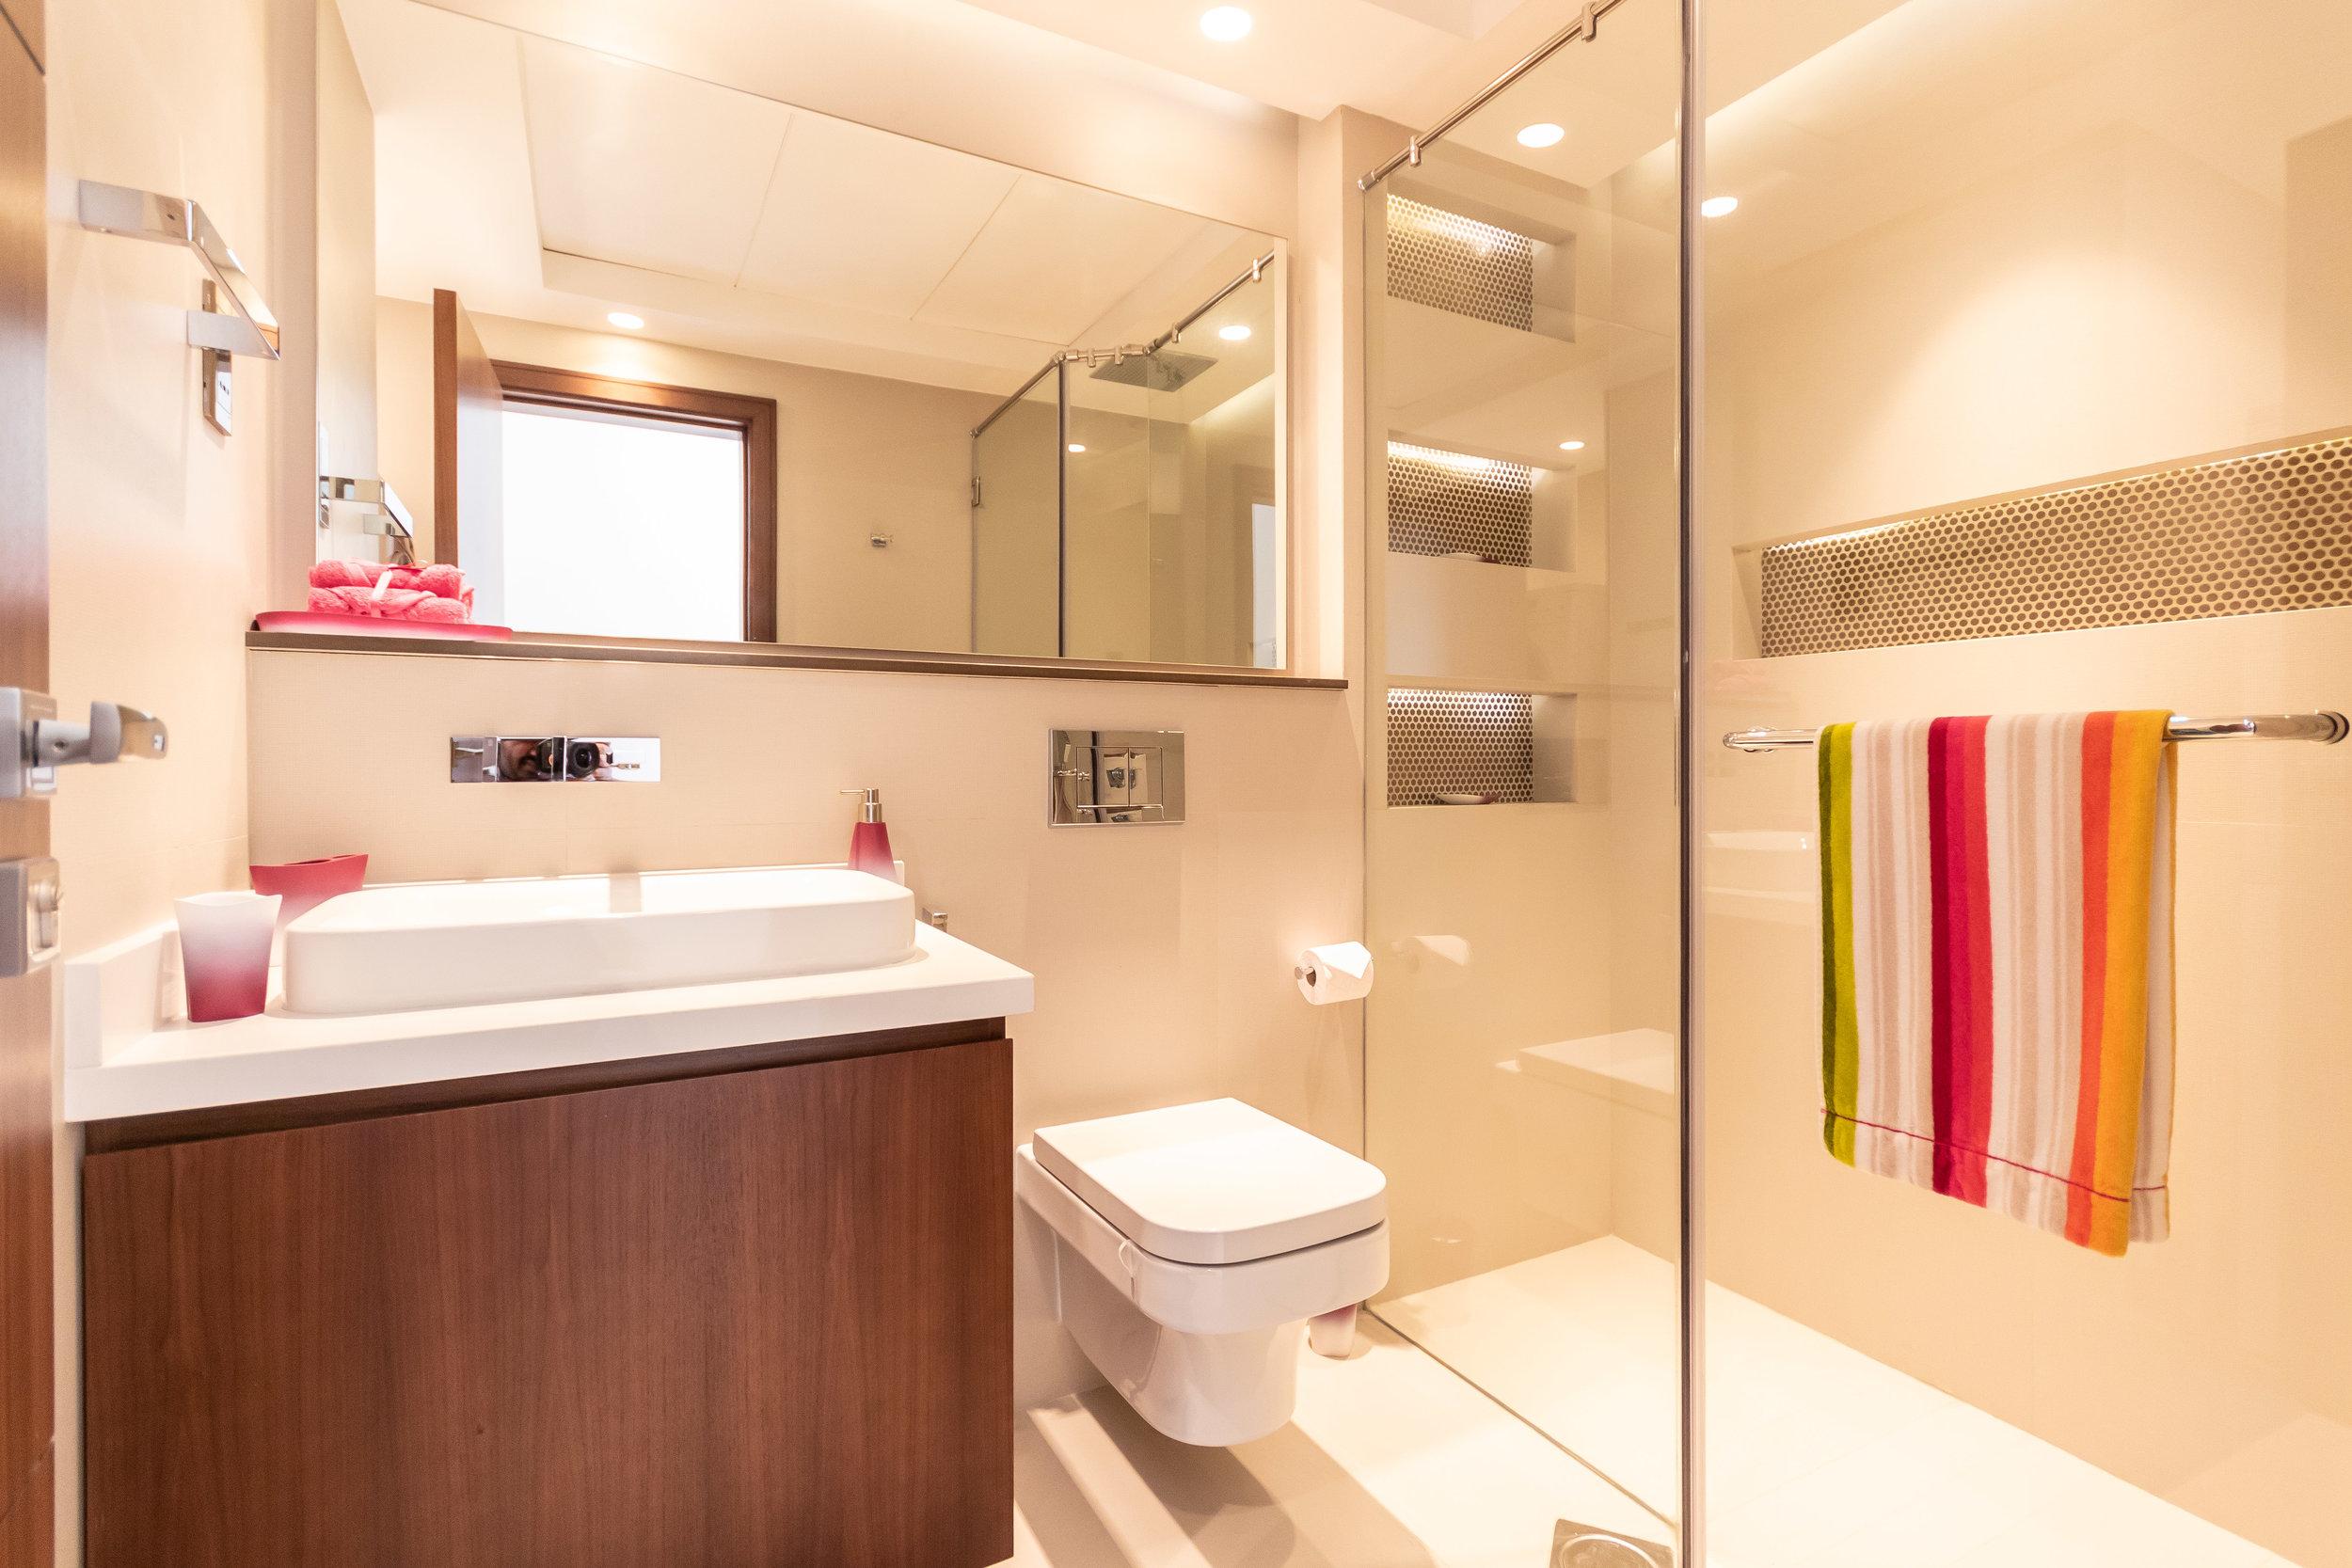 Second bathroom, with contemporary design